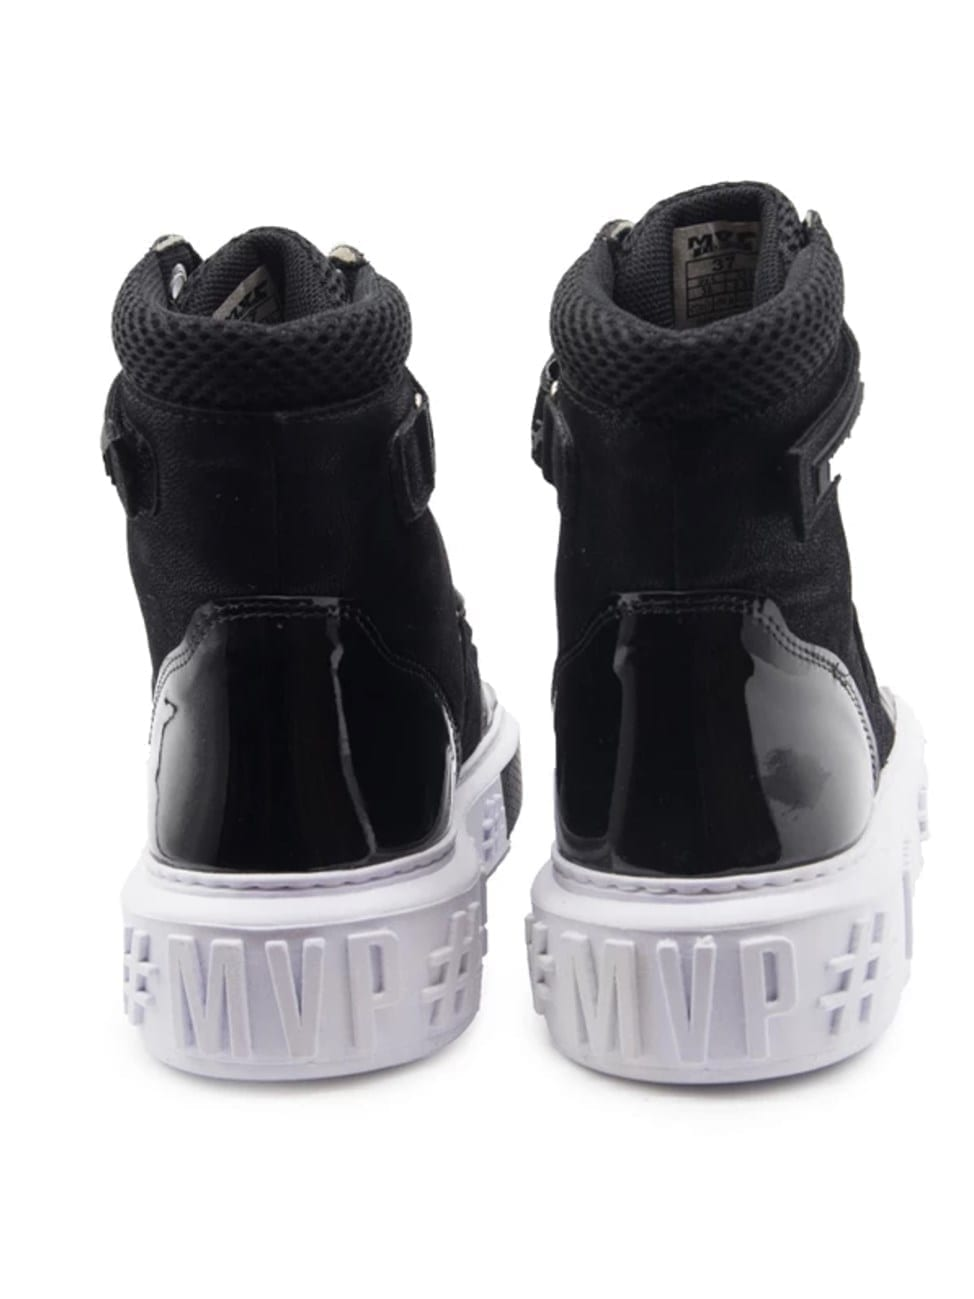 MVP Fitness Fit Focus Sneakers - 70143 - Black